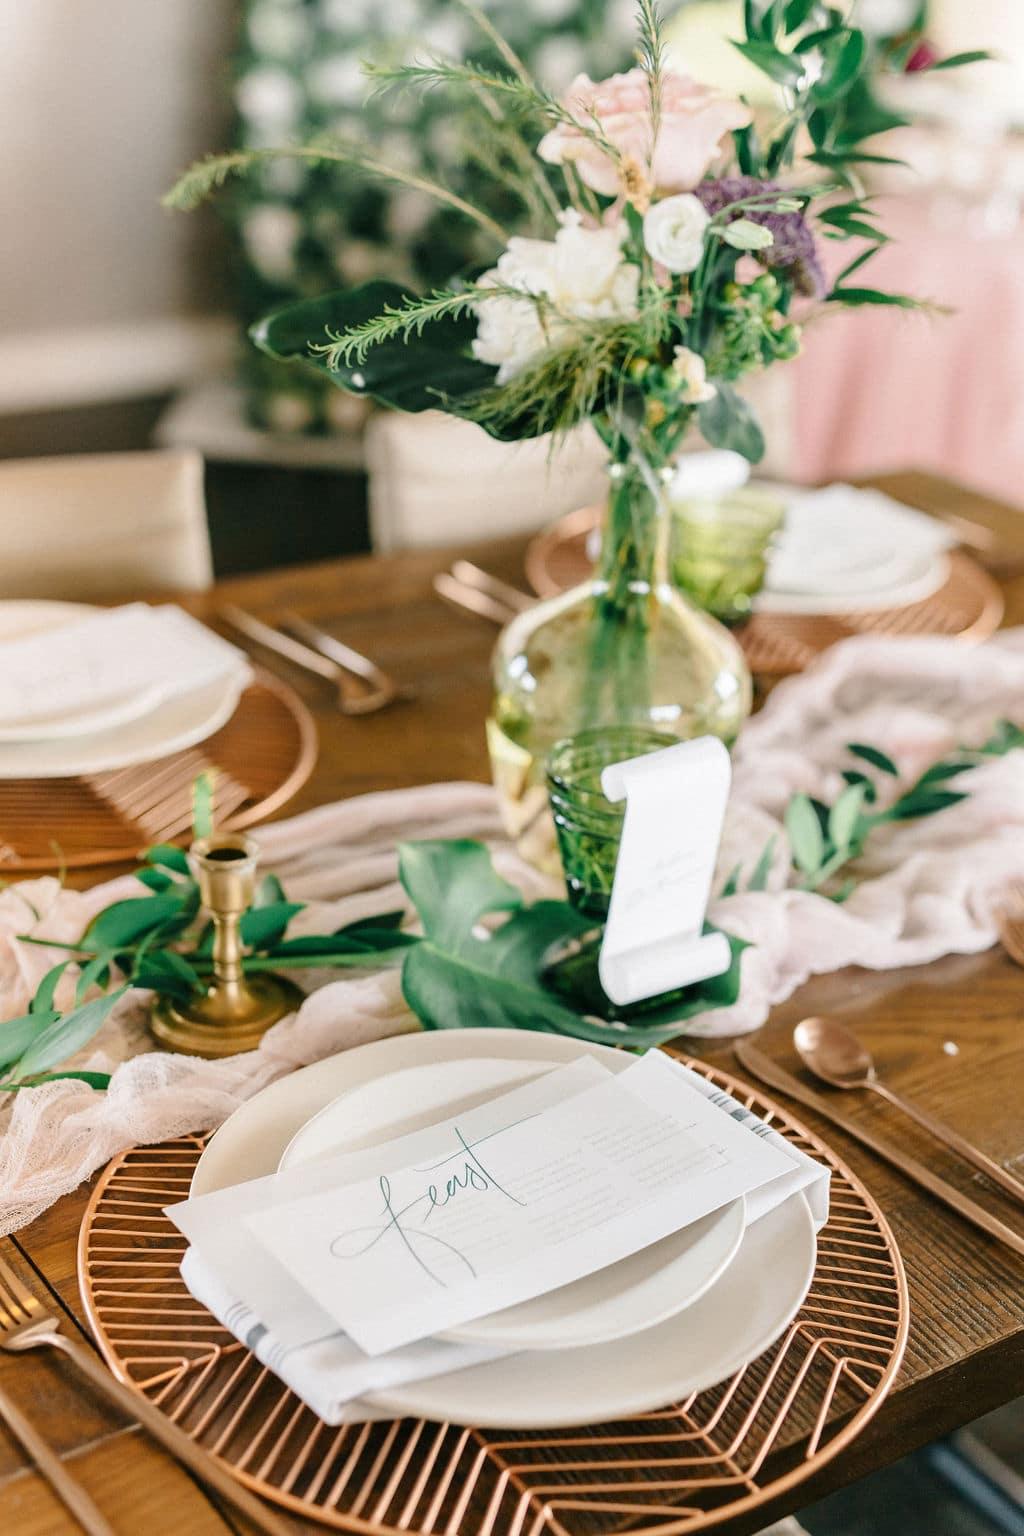 micro wedding Disney Princess and the Frog Wedding Theme reception table decor